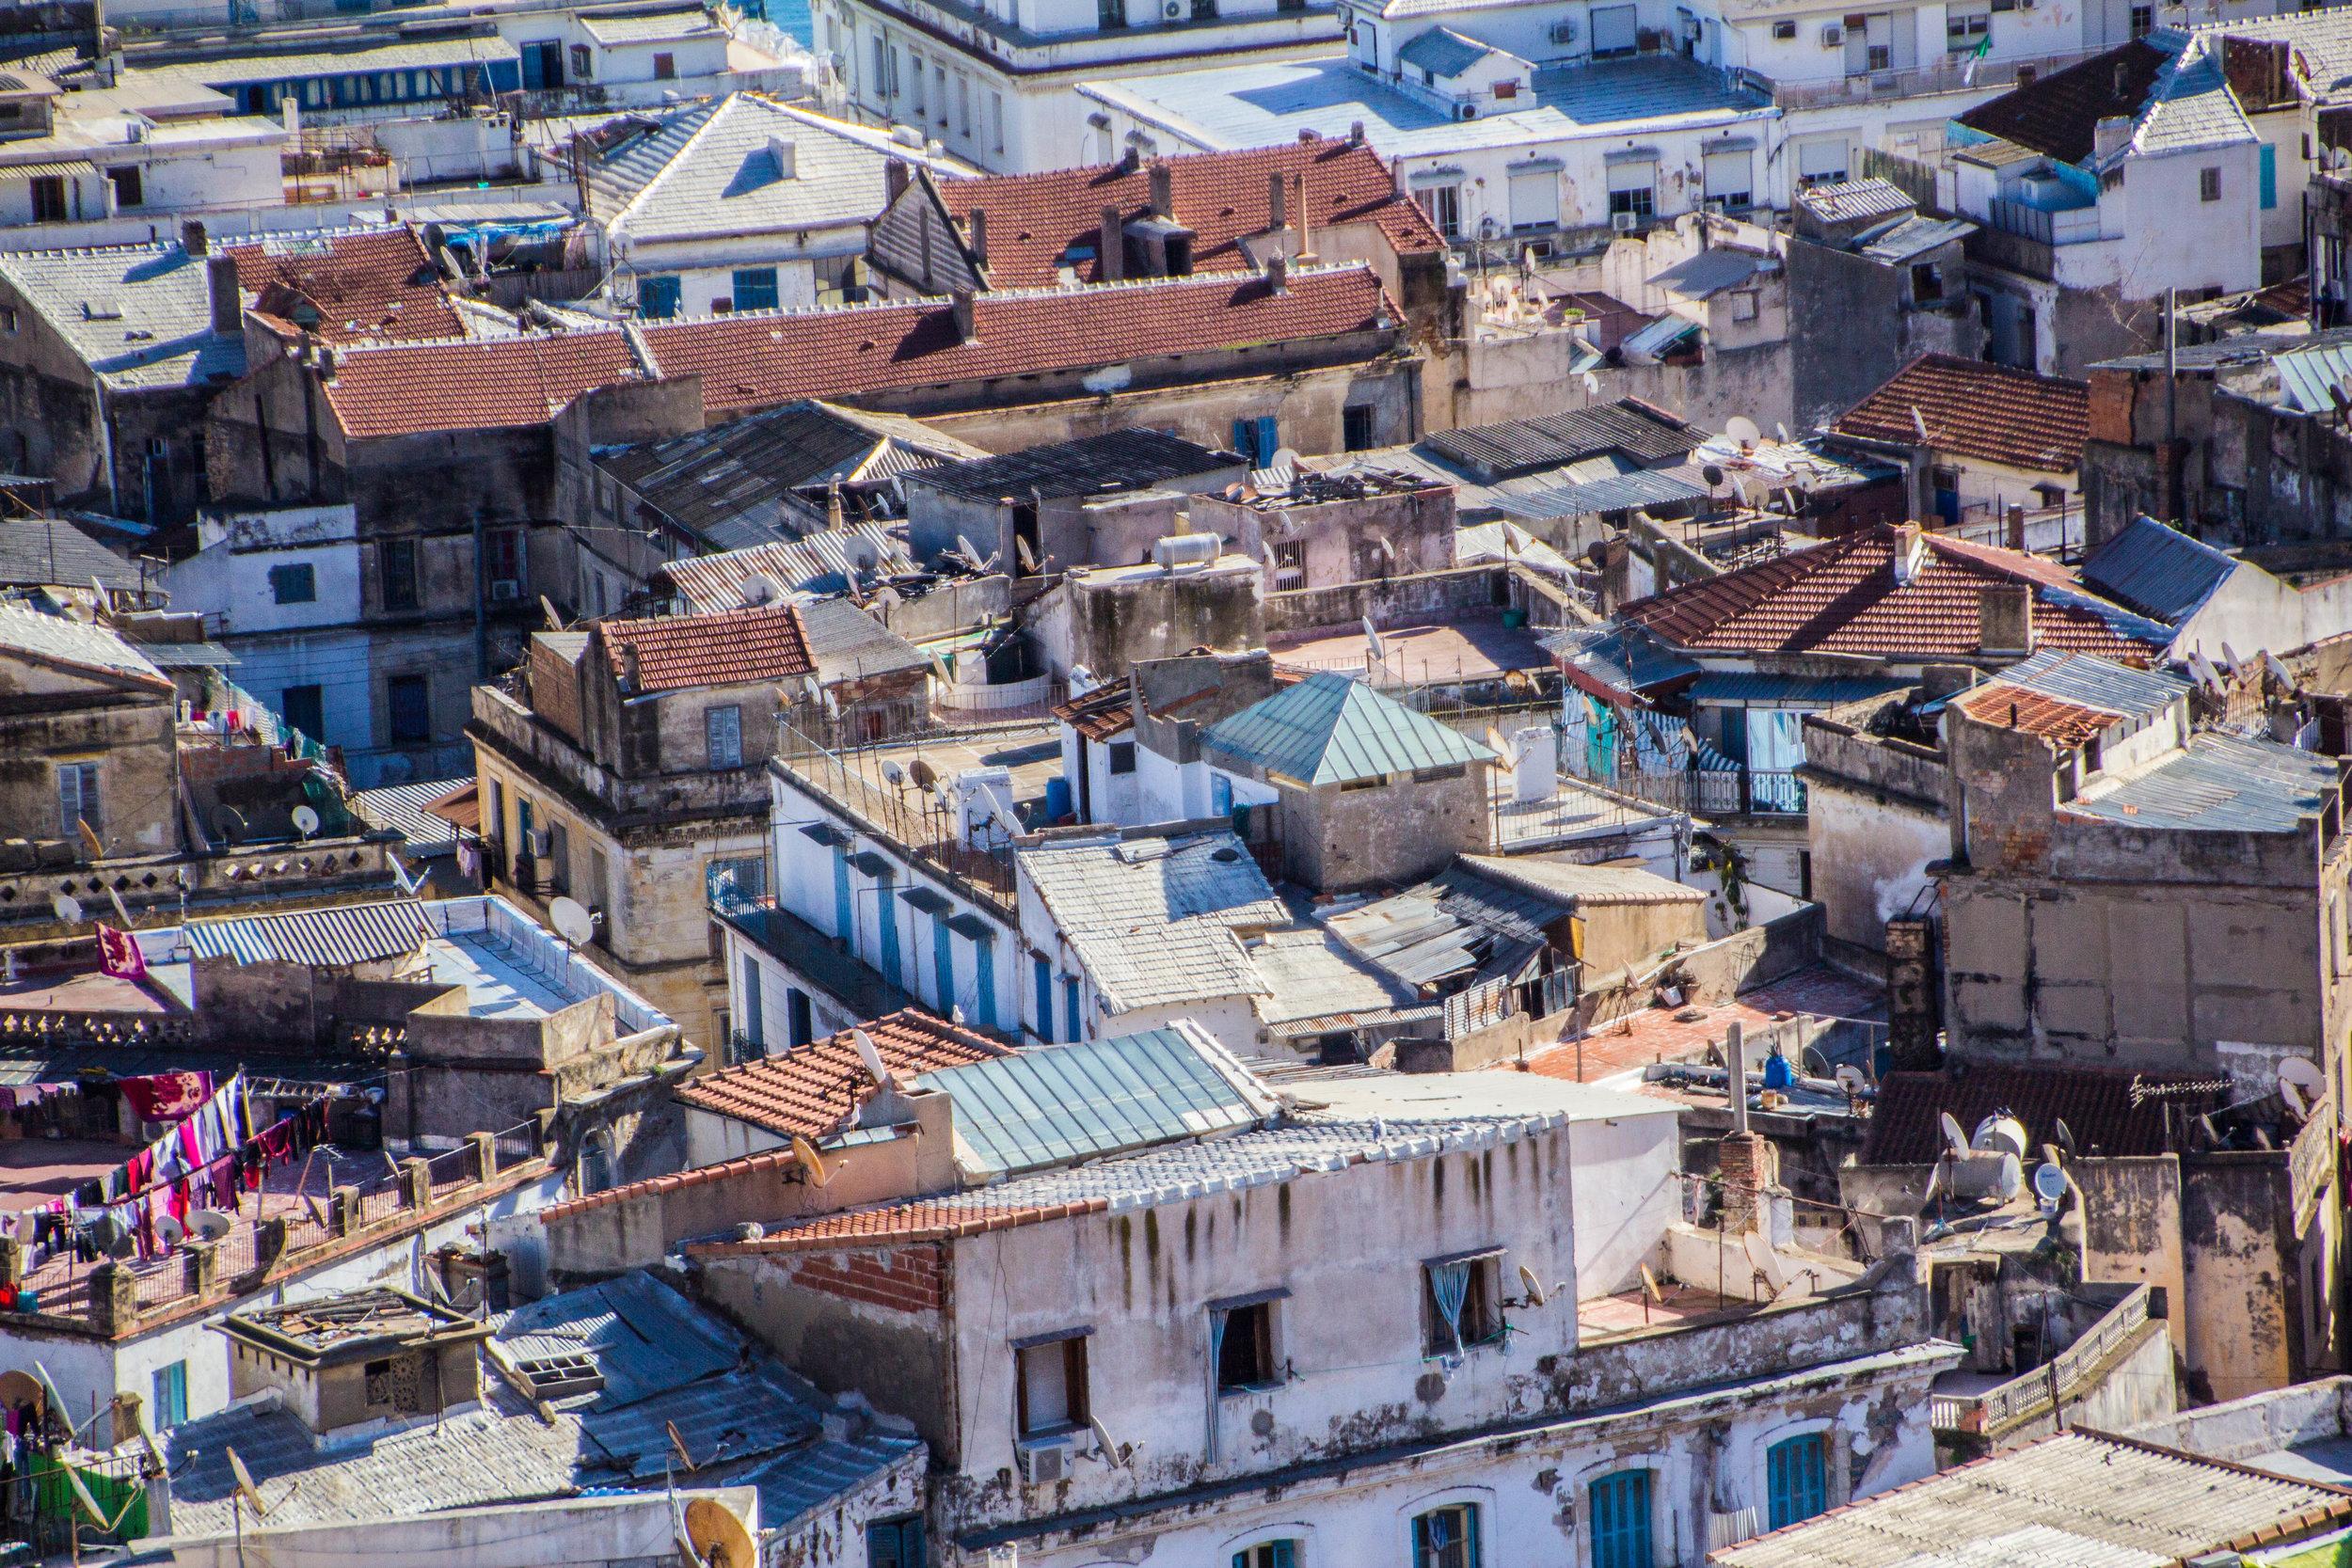 casbah-from-above-algiers-algeria-35.jpg